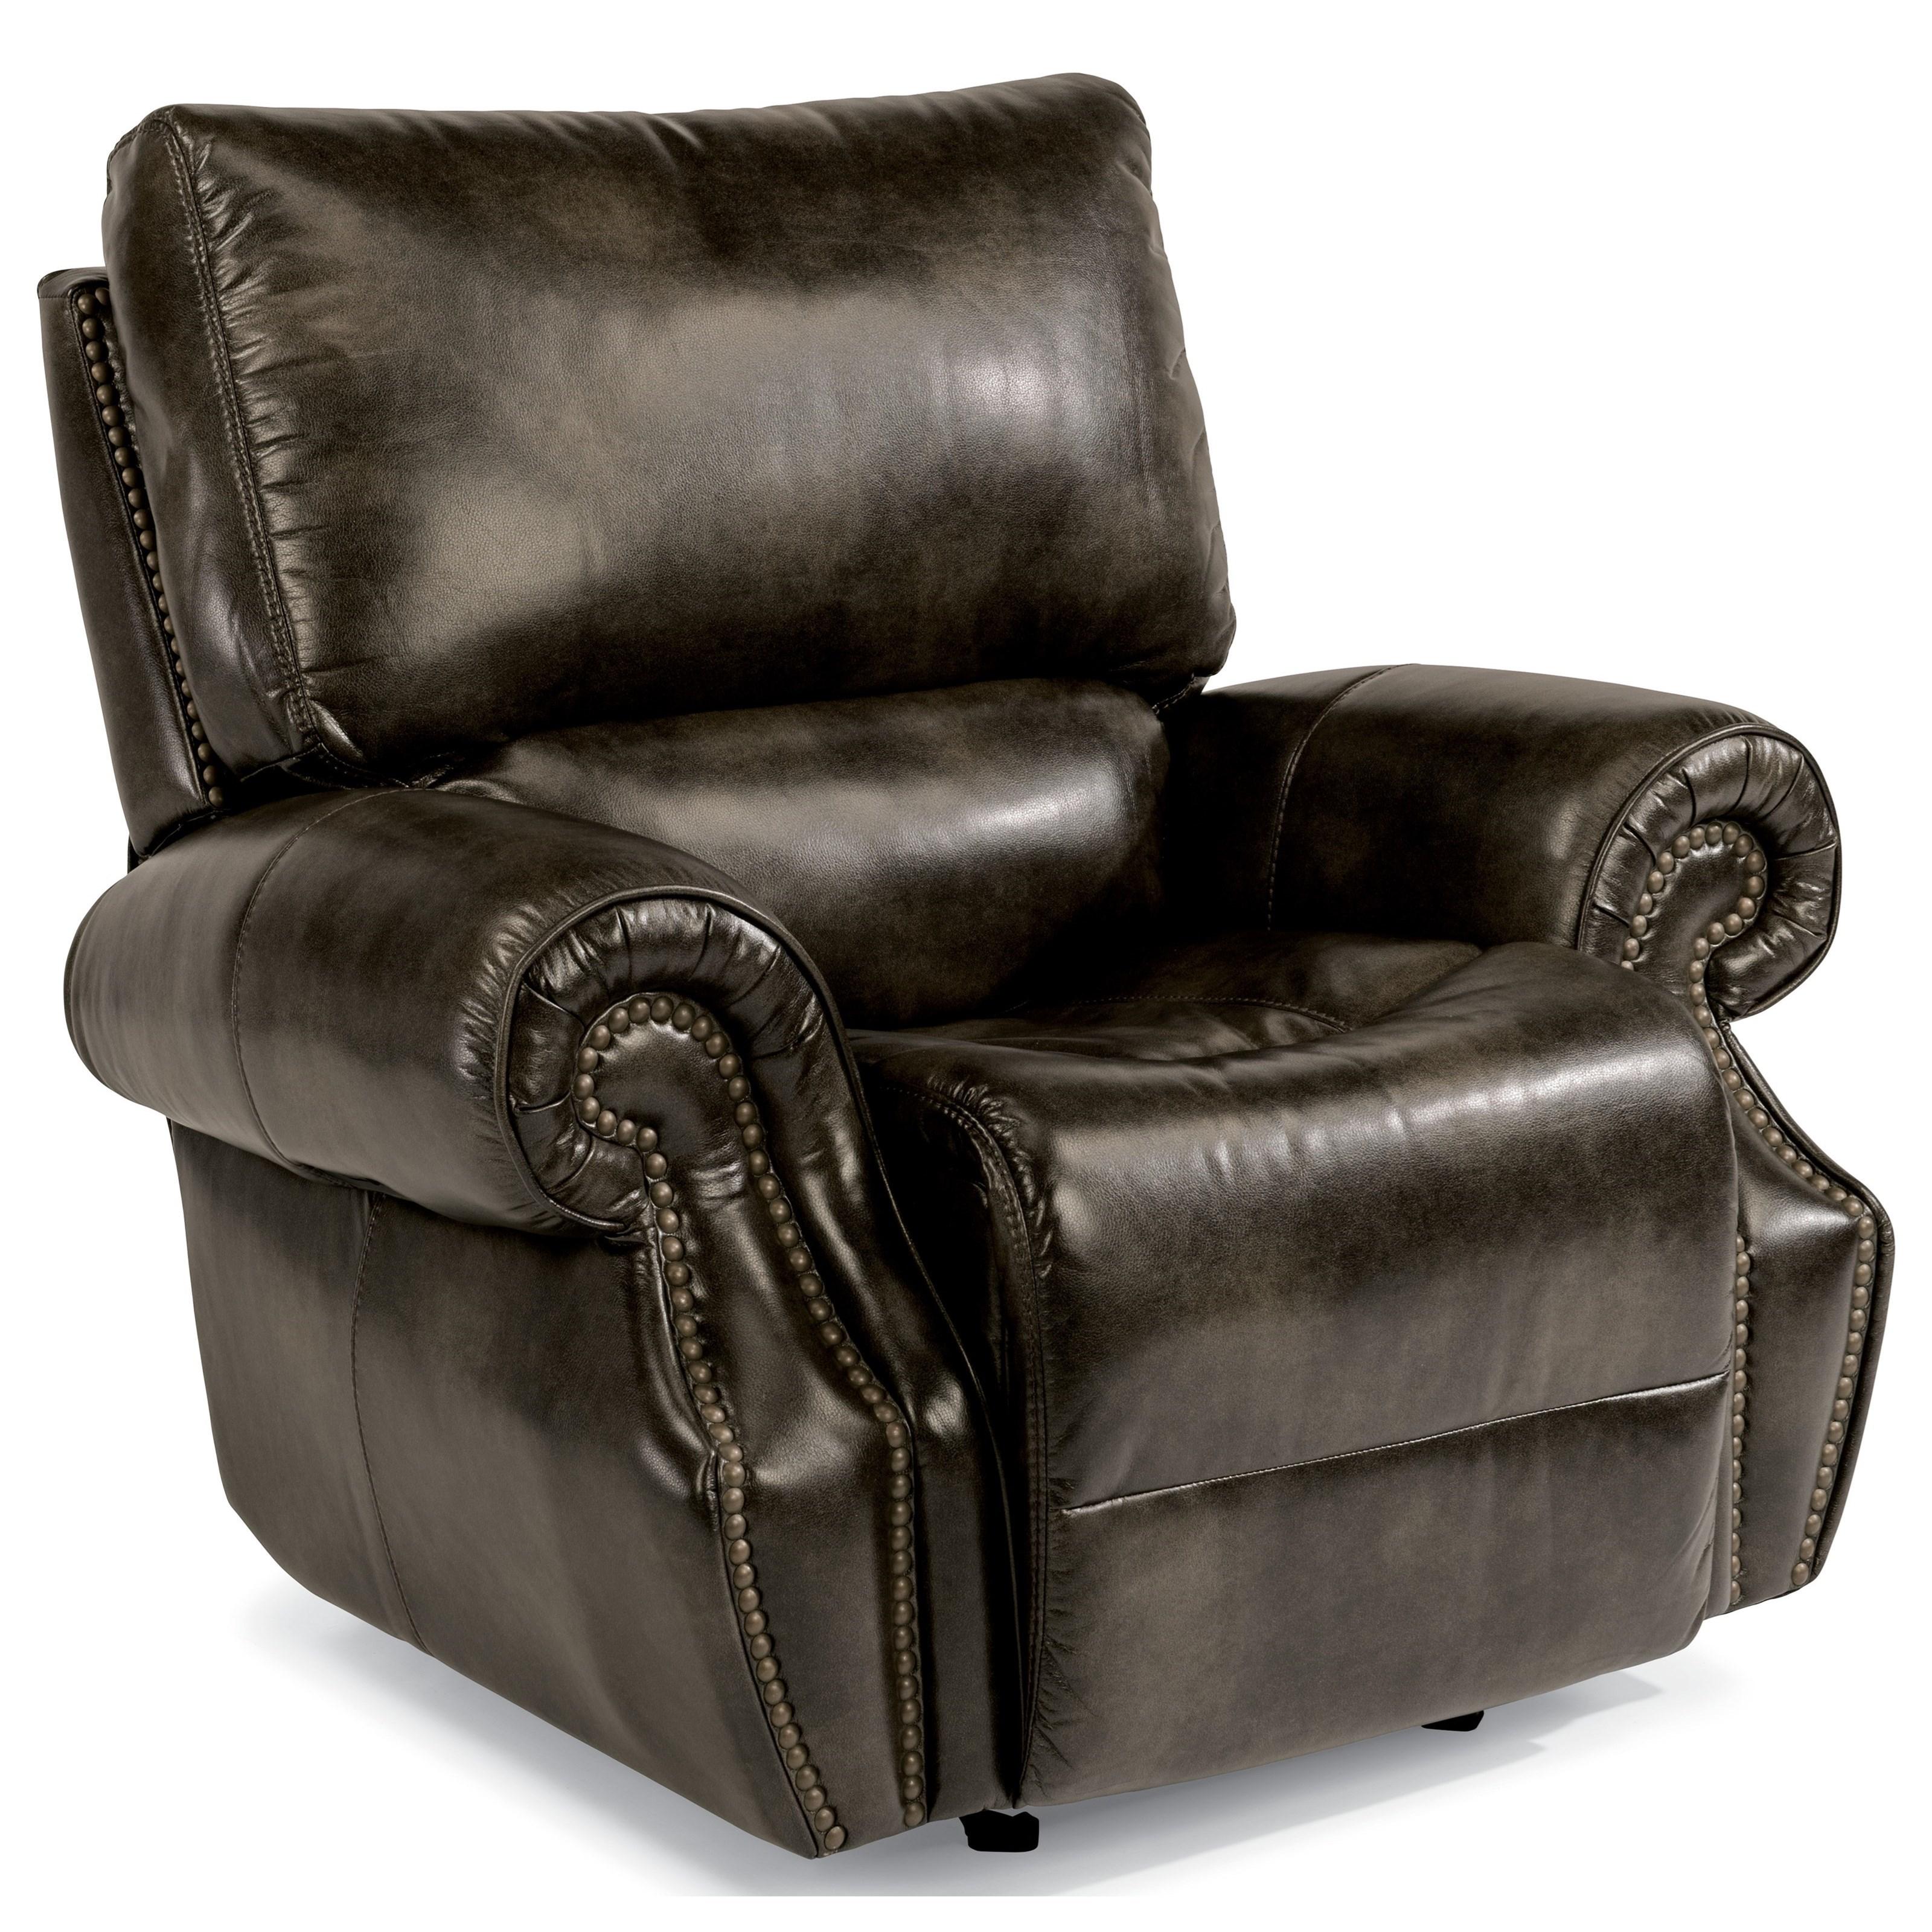 Flexsteel Latitudes-Colton Pwr Gliding Recl w/ Pwr Headrest - Item Number: 1582-54PH